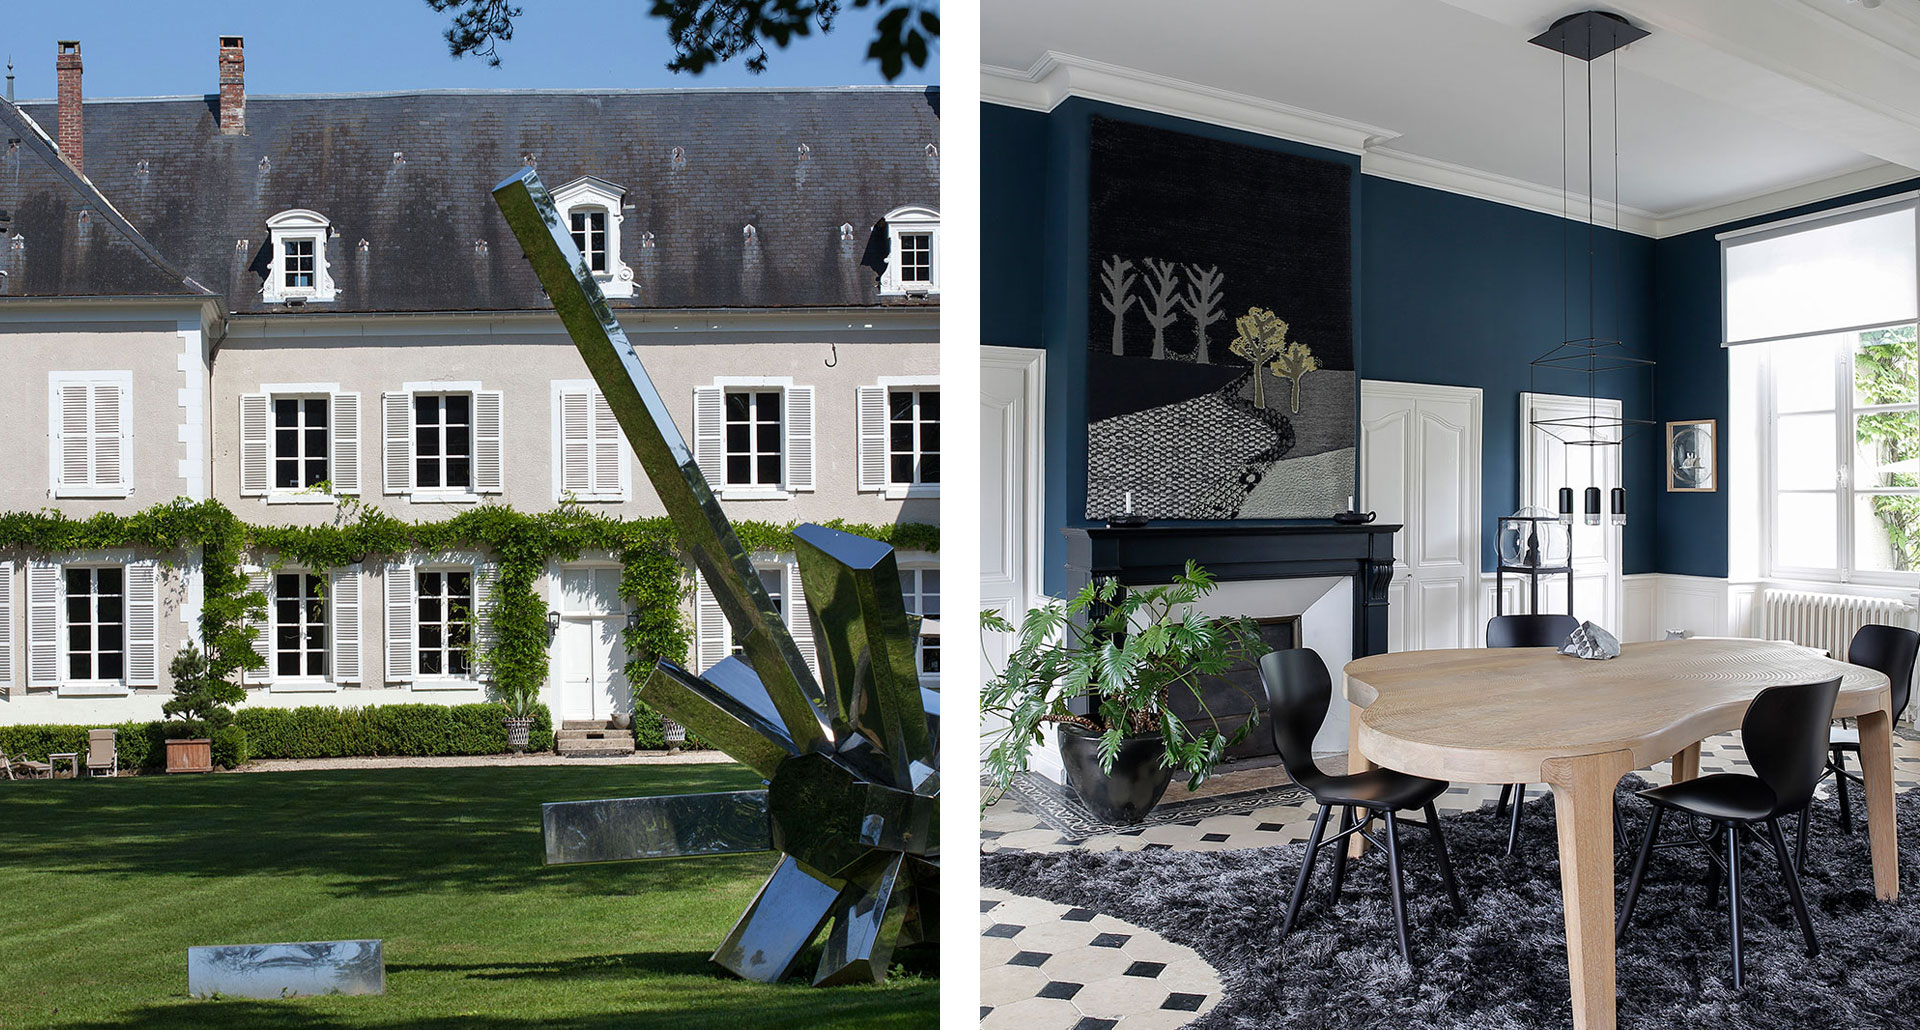 Chateau de la Resle - boutique hotel in Montigny la Resle